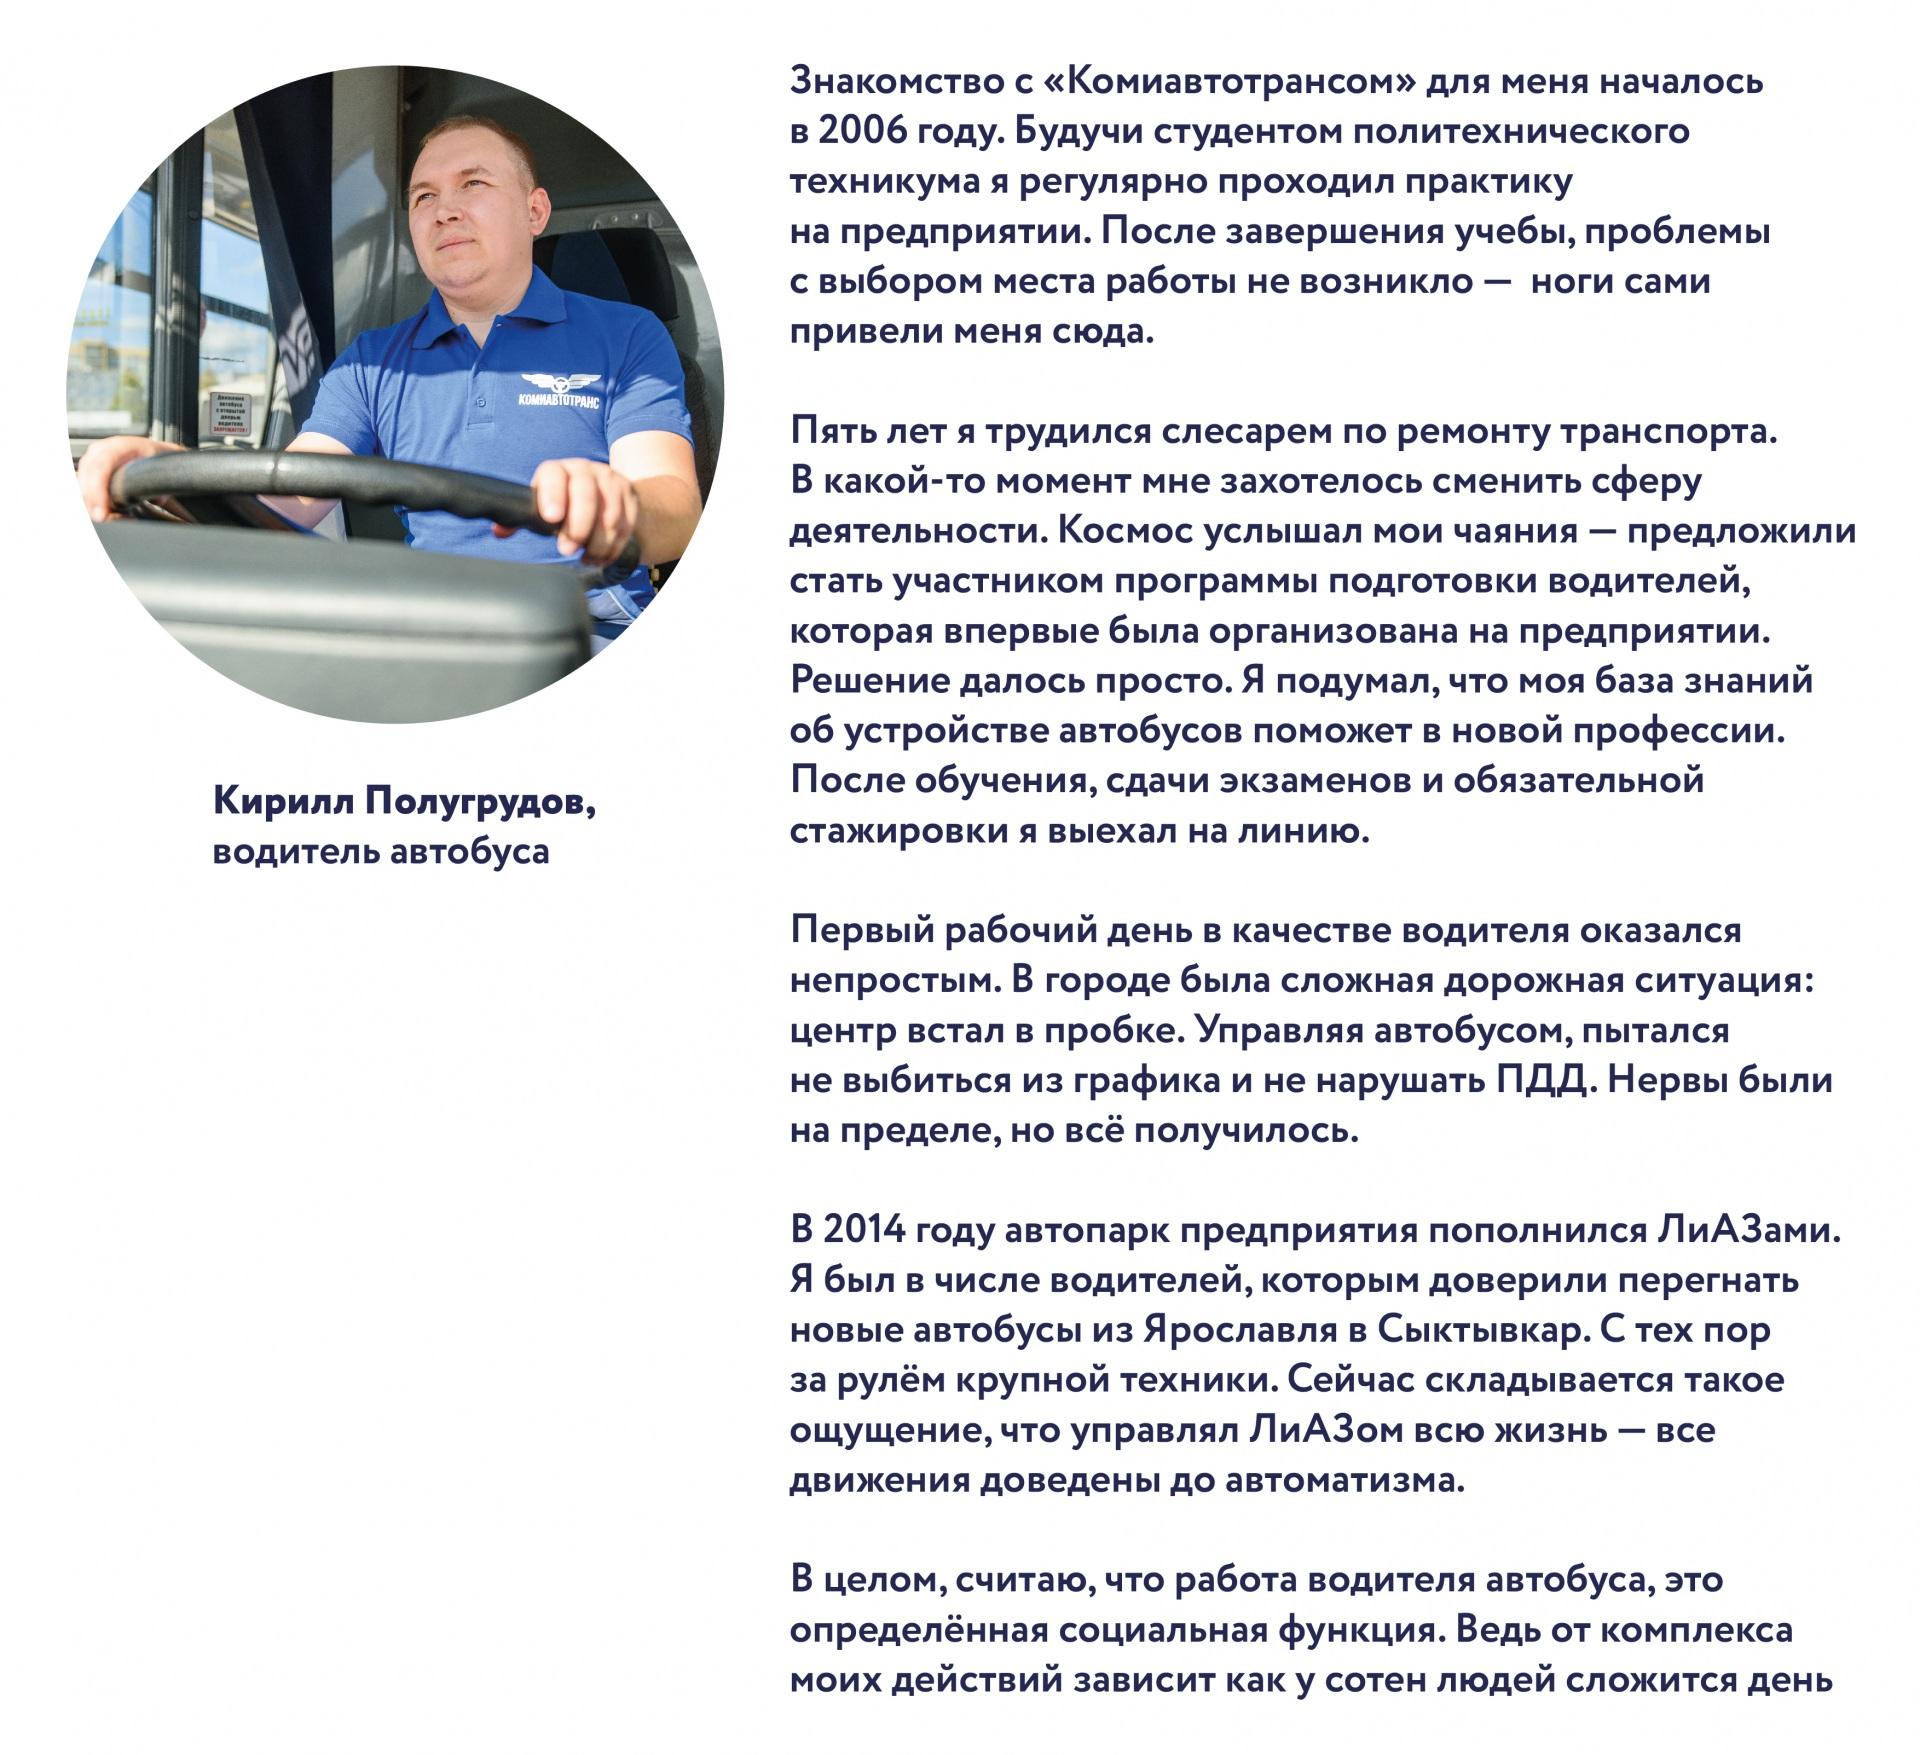 K.-Polugrudov-01.jpg